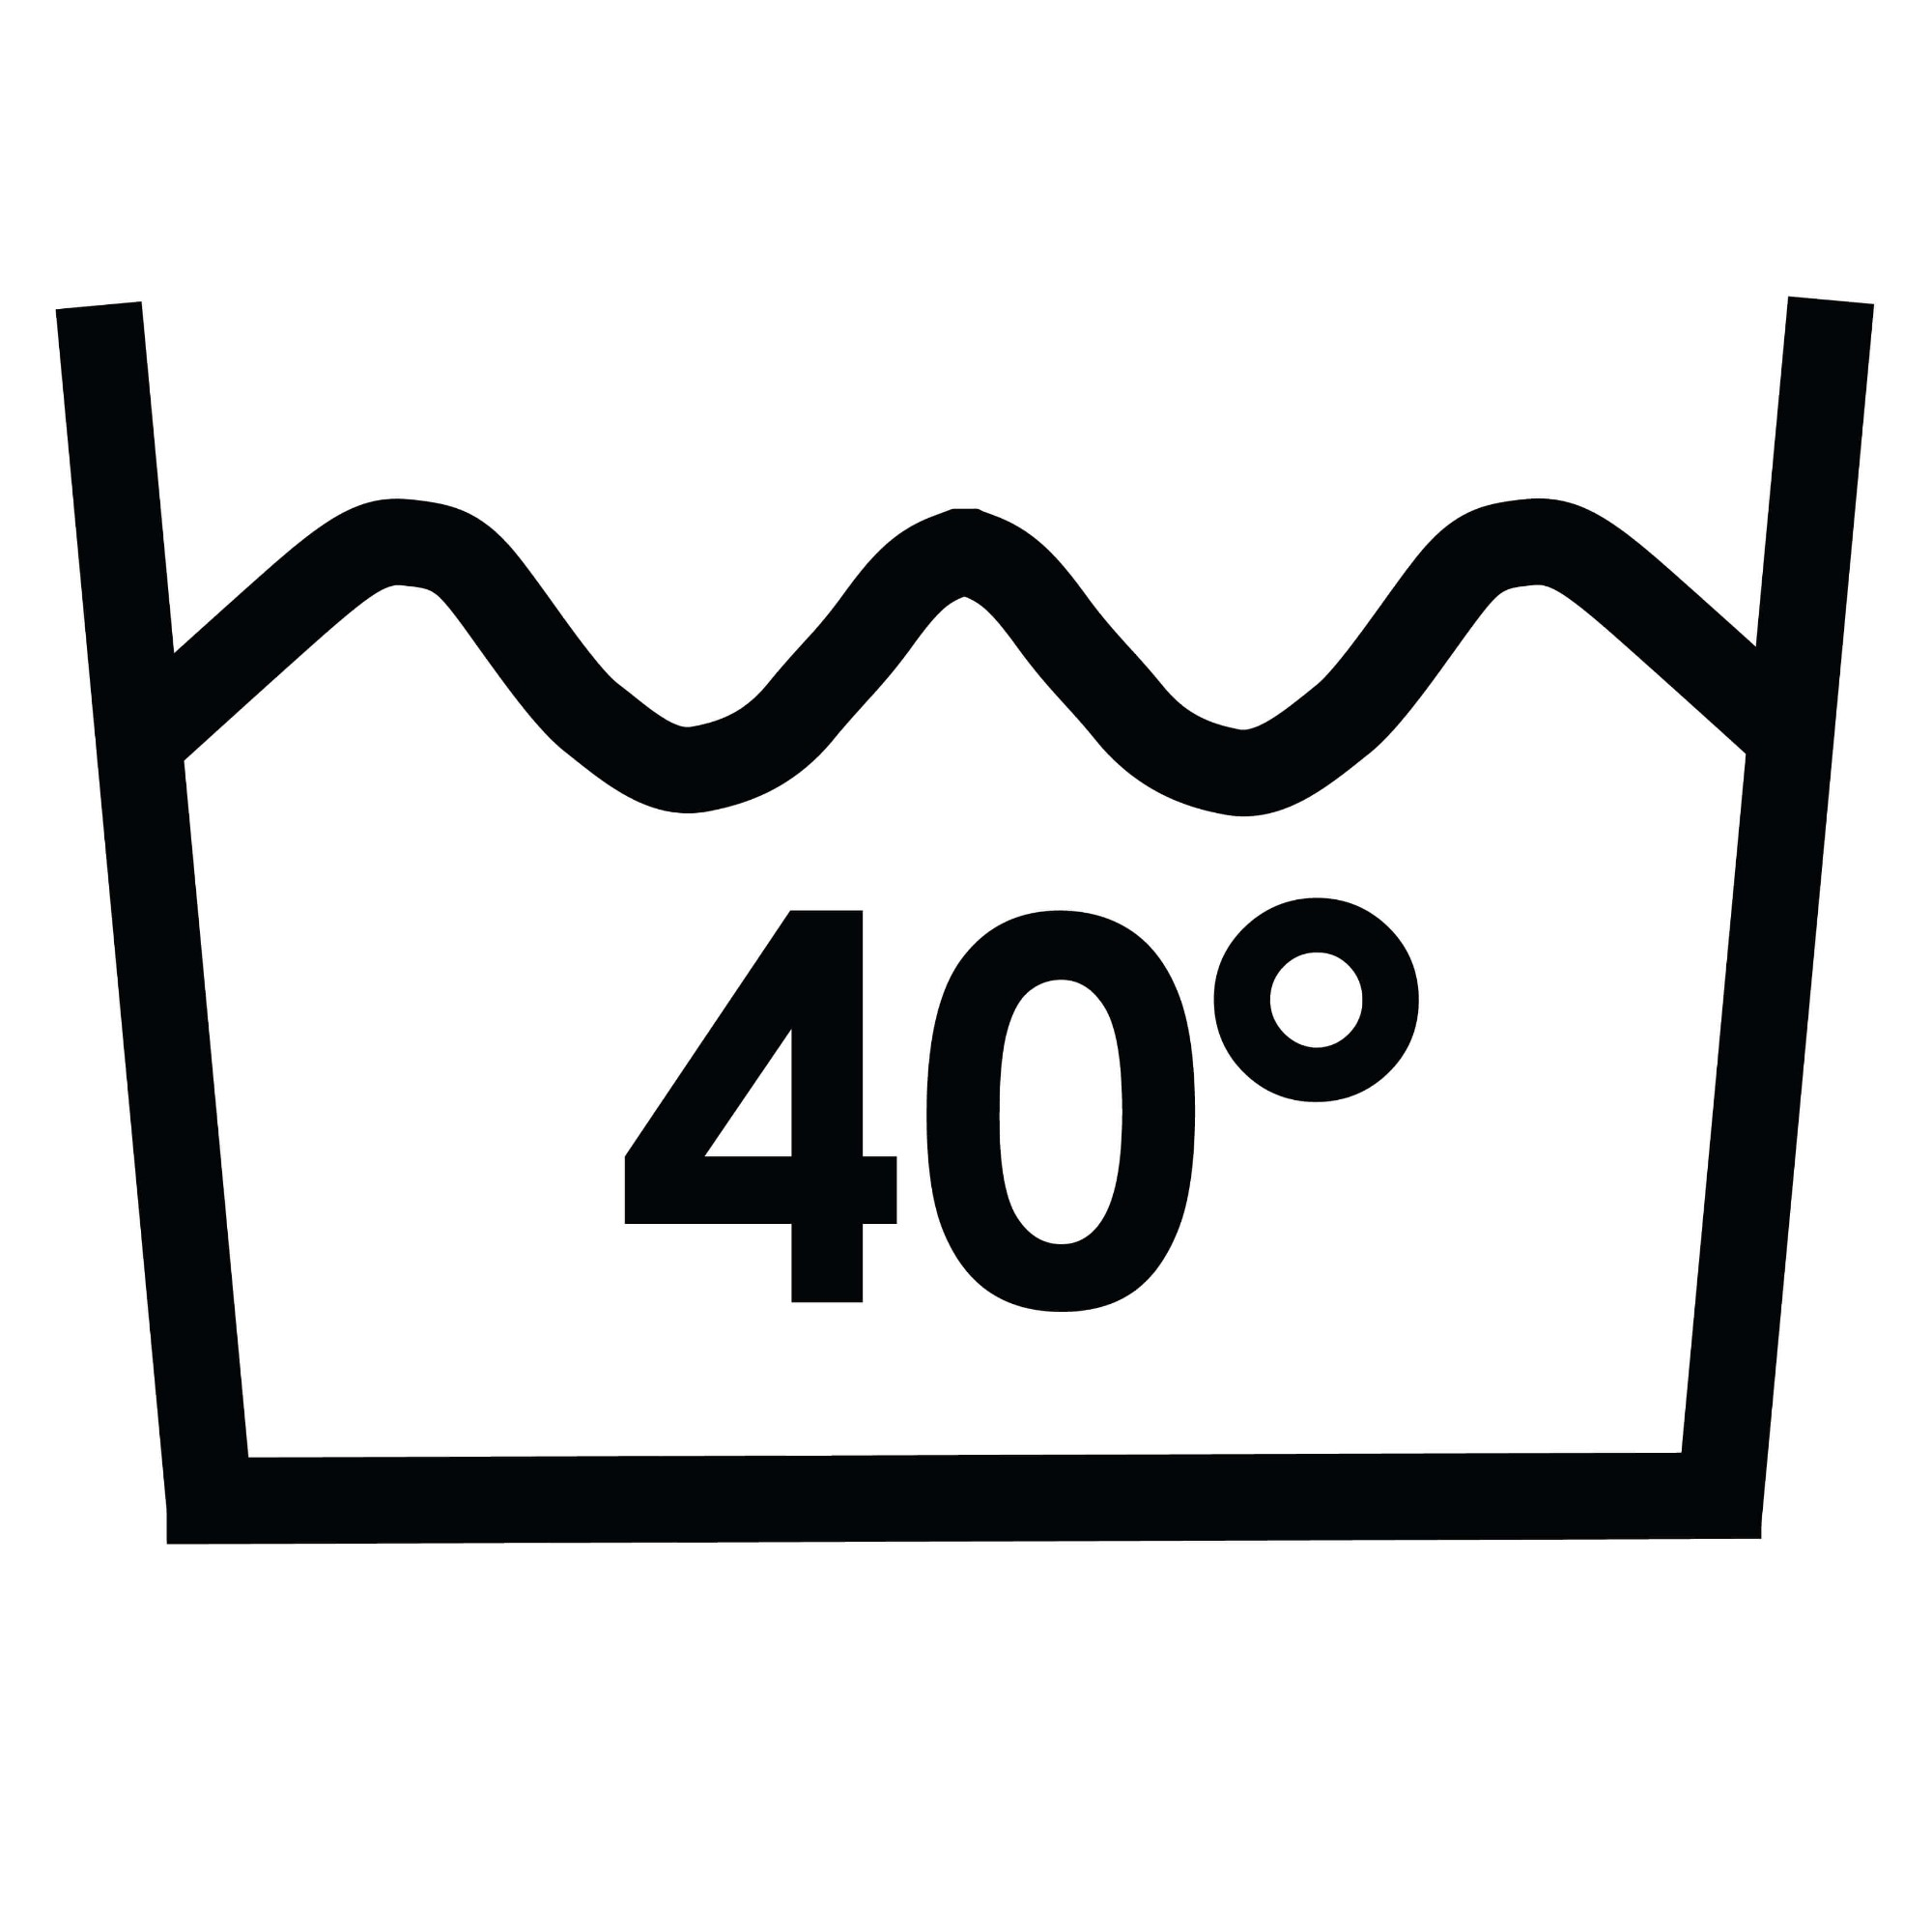 Veepesu kuni 40 °C